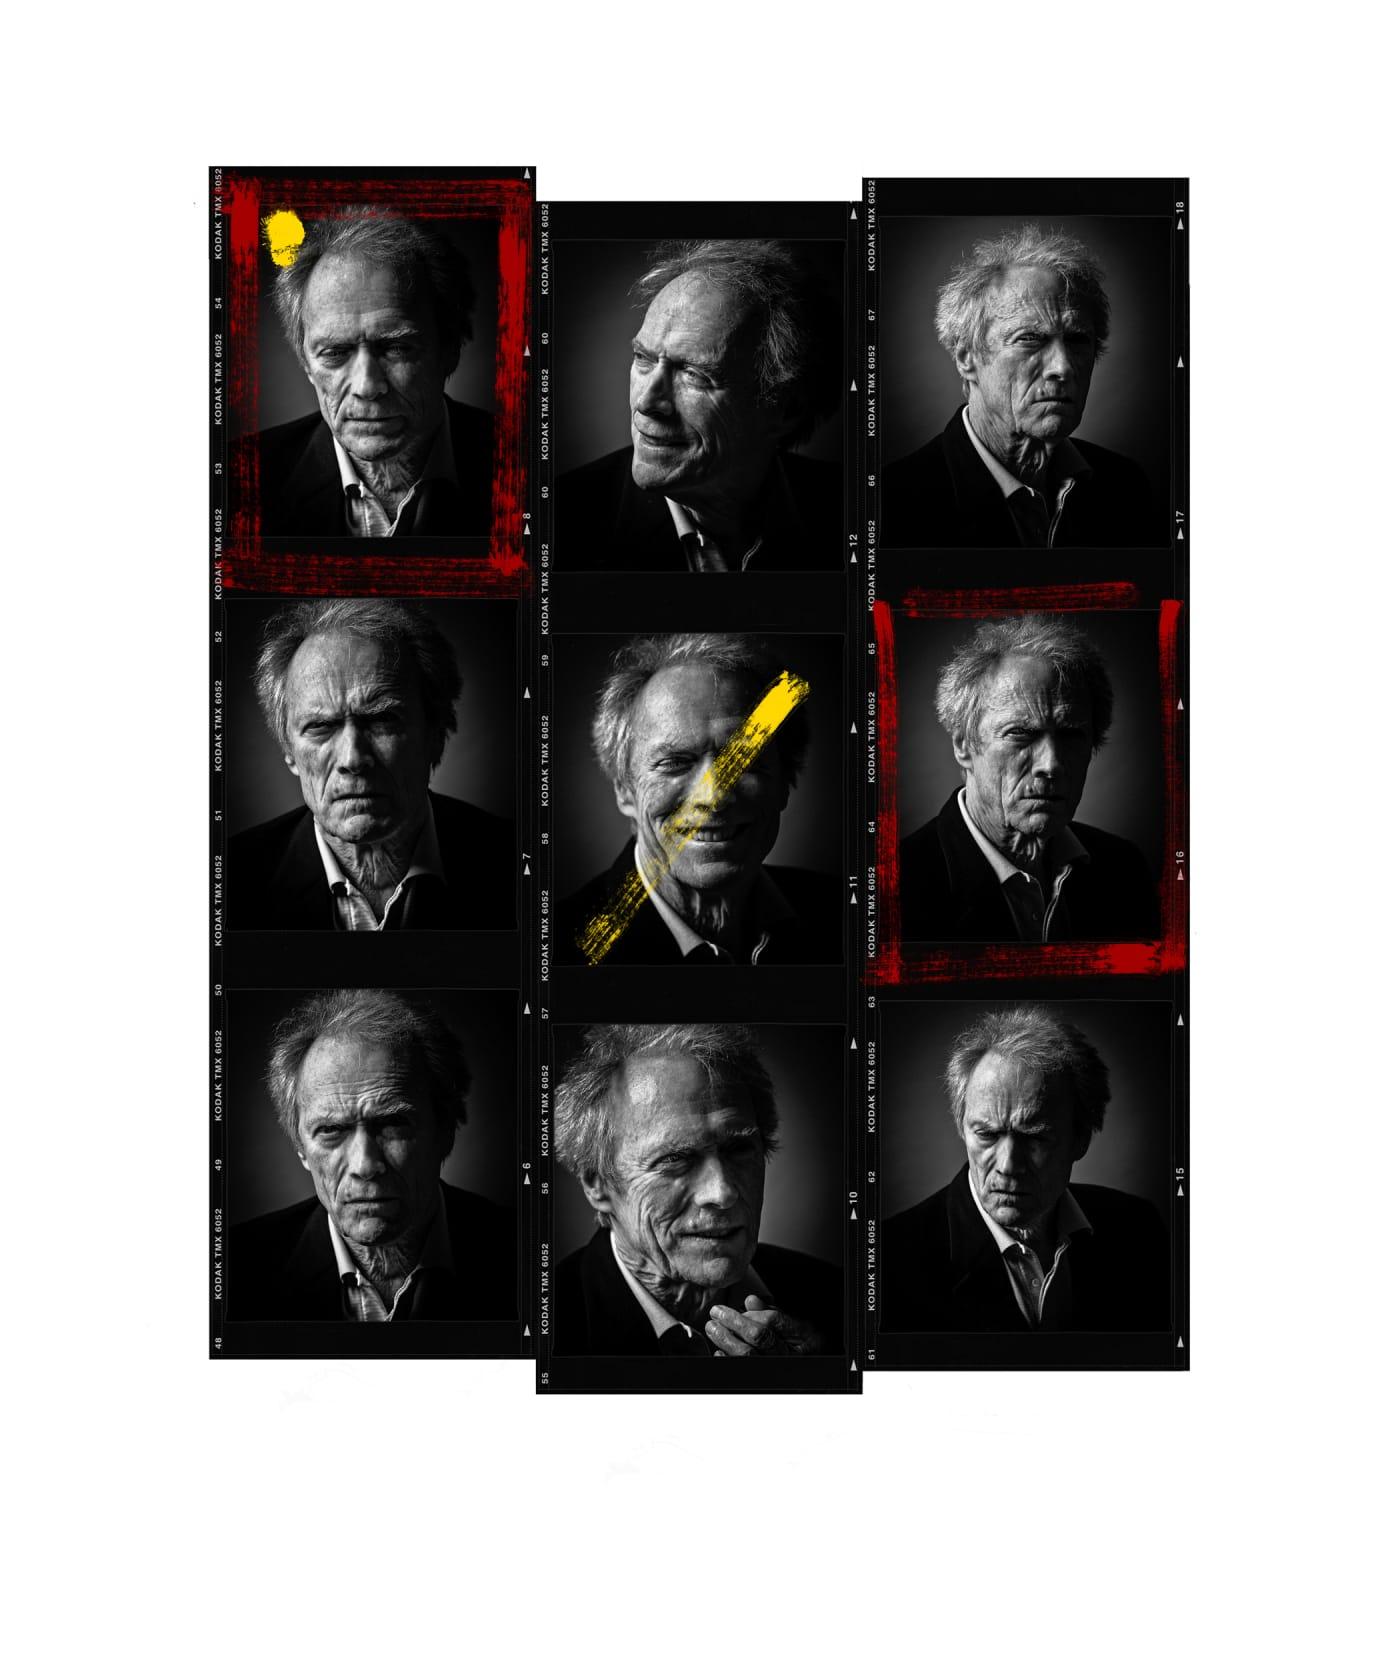 Andy Gotts Clint Eastwood Contact Sheet Fine Art Giclée Archival Print